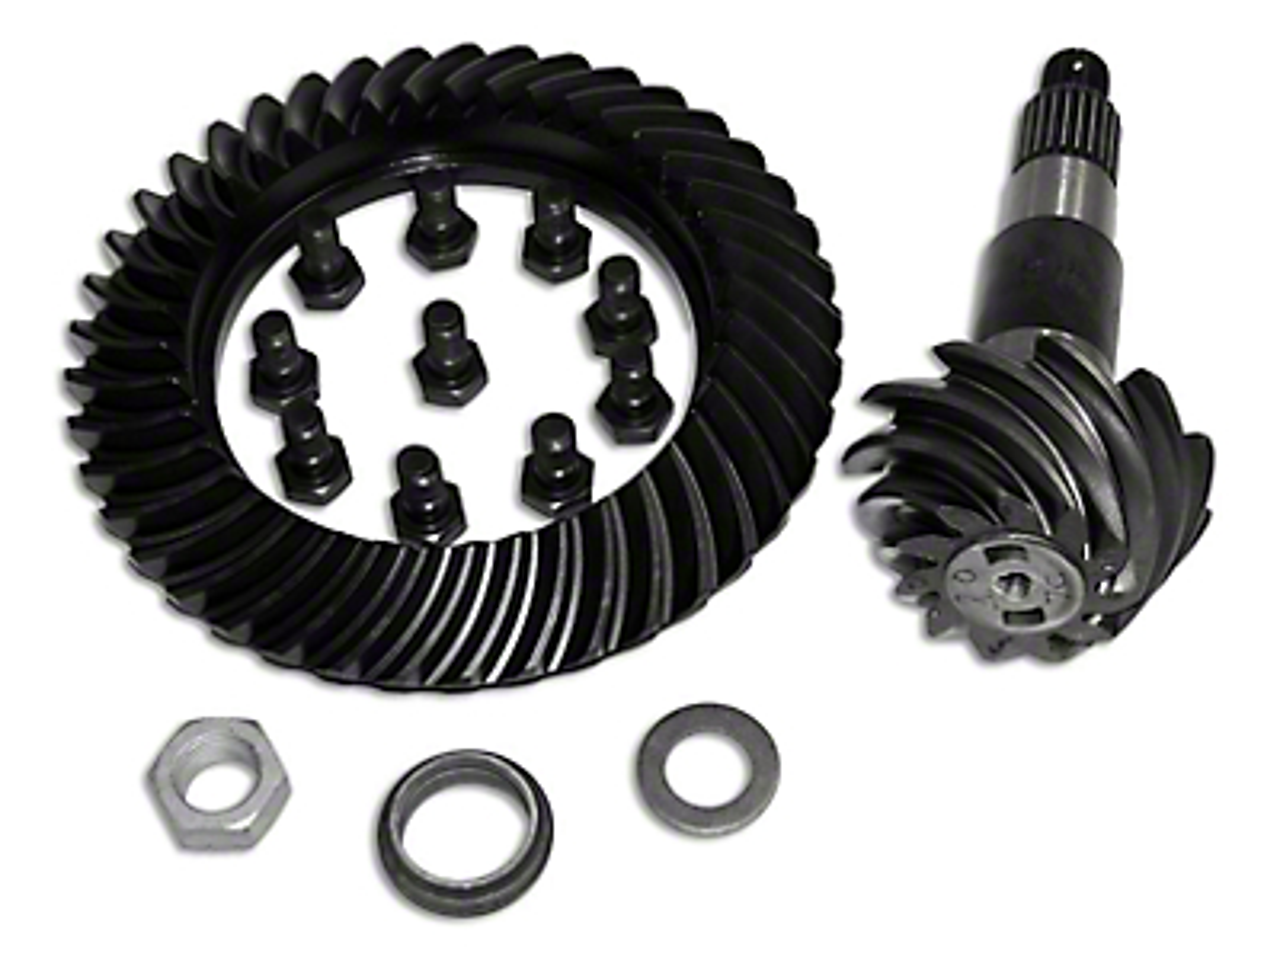 Crown Automotive Dana 44 Rear Ring Gear and Pinion Kit - 3.73 Gears (08-18 Wrangler JK)